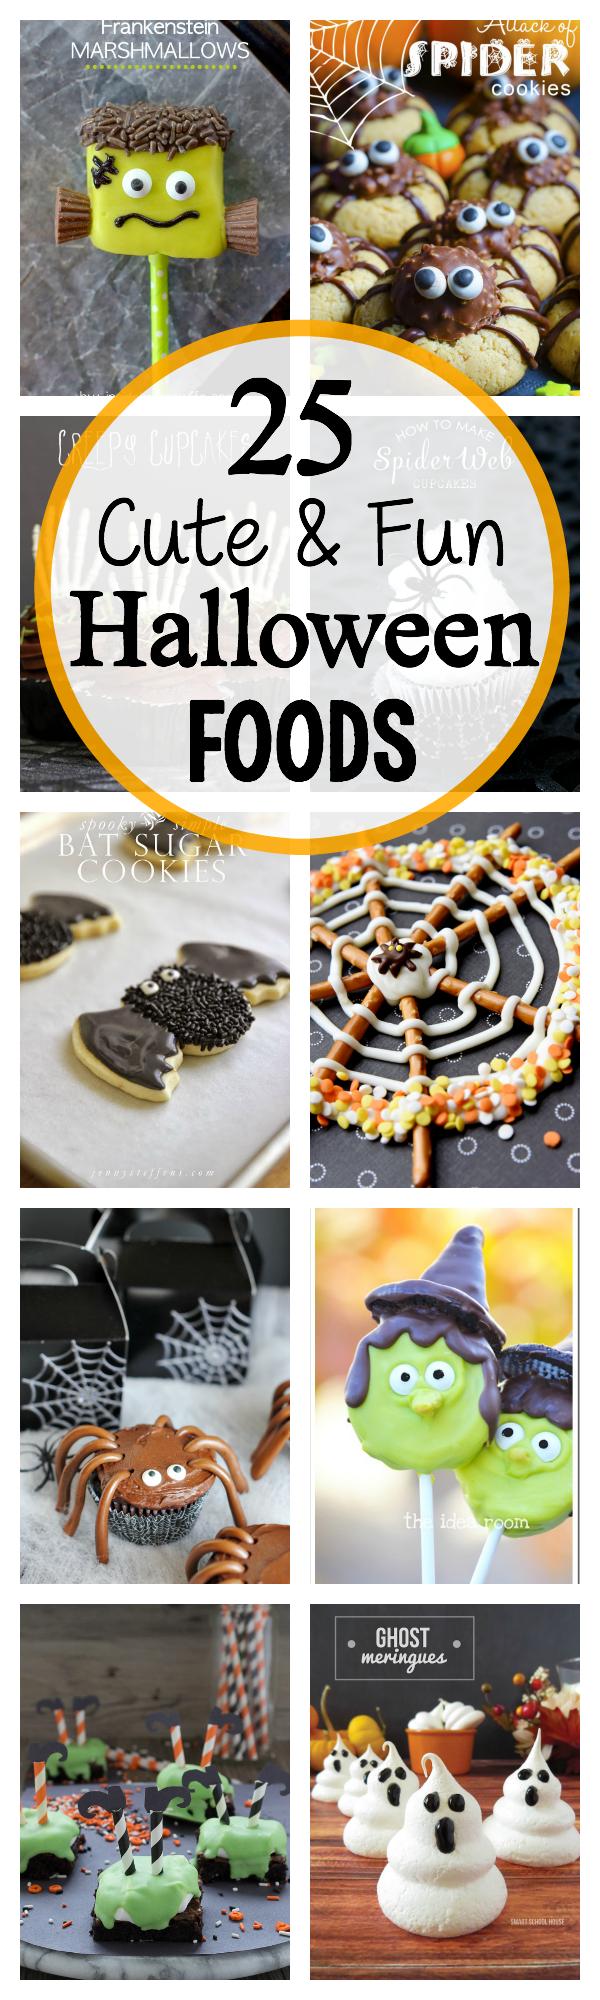 25 Cute and Fun Halloween Food Ideas